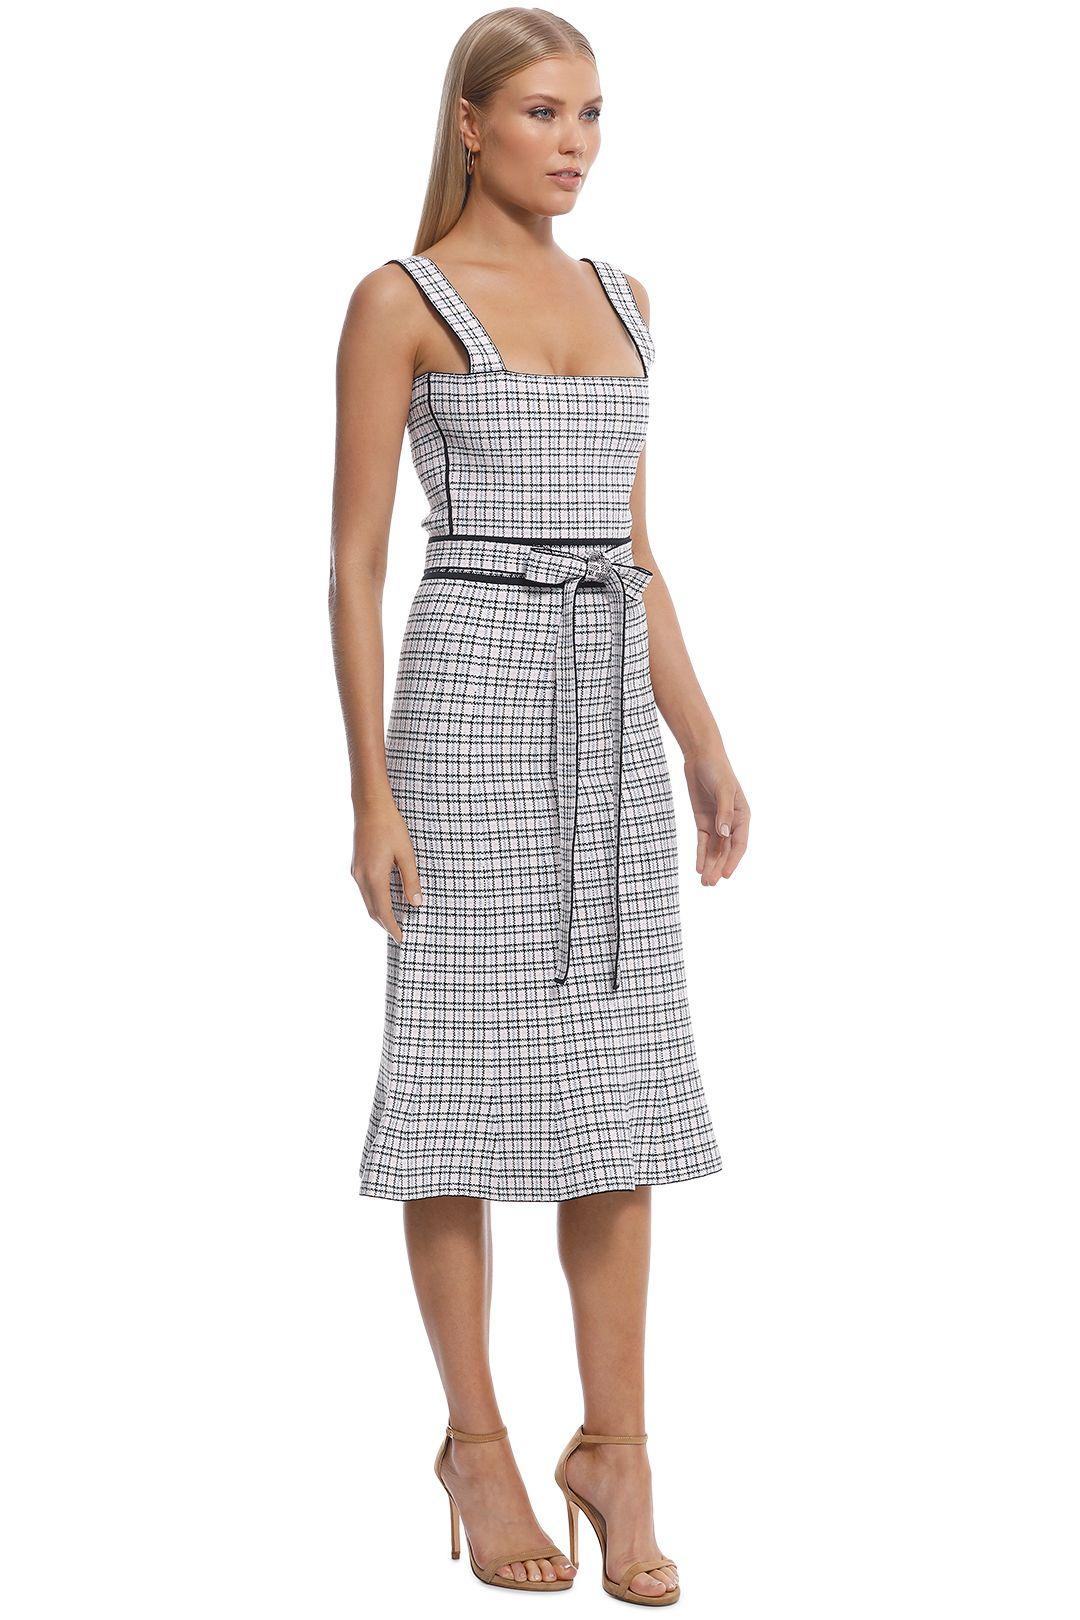 Scanlan Theodore - Crepe Knit Plaid Bralette Dress - Pale Pink - Side